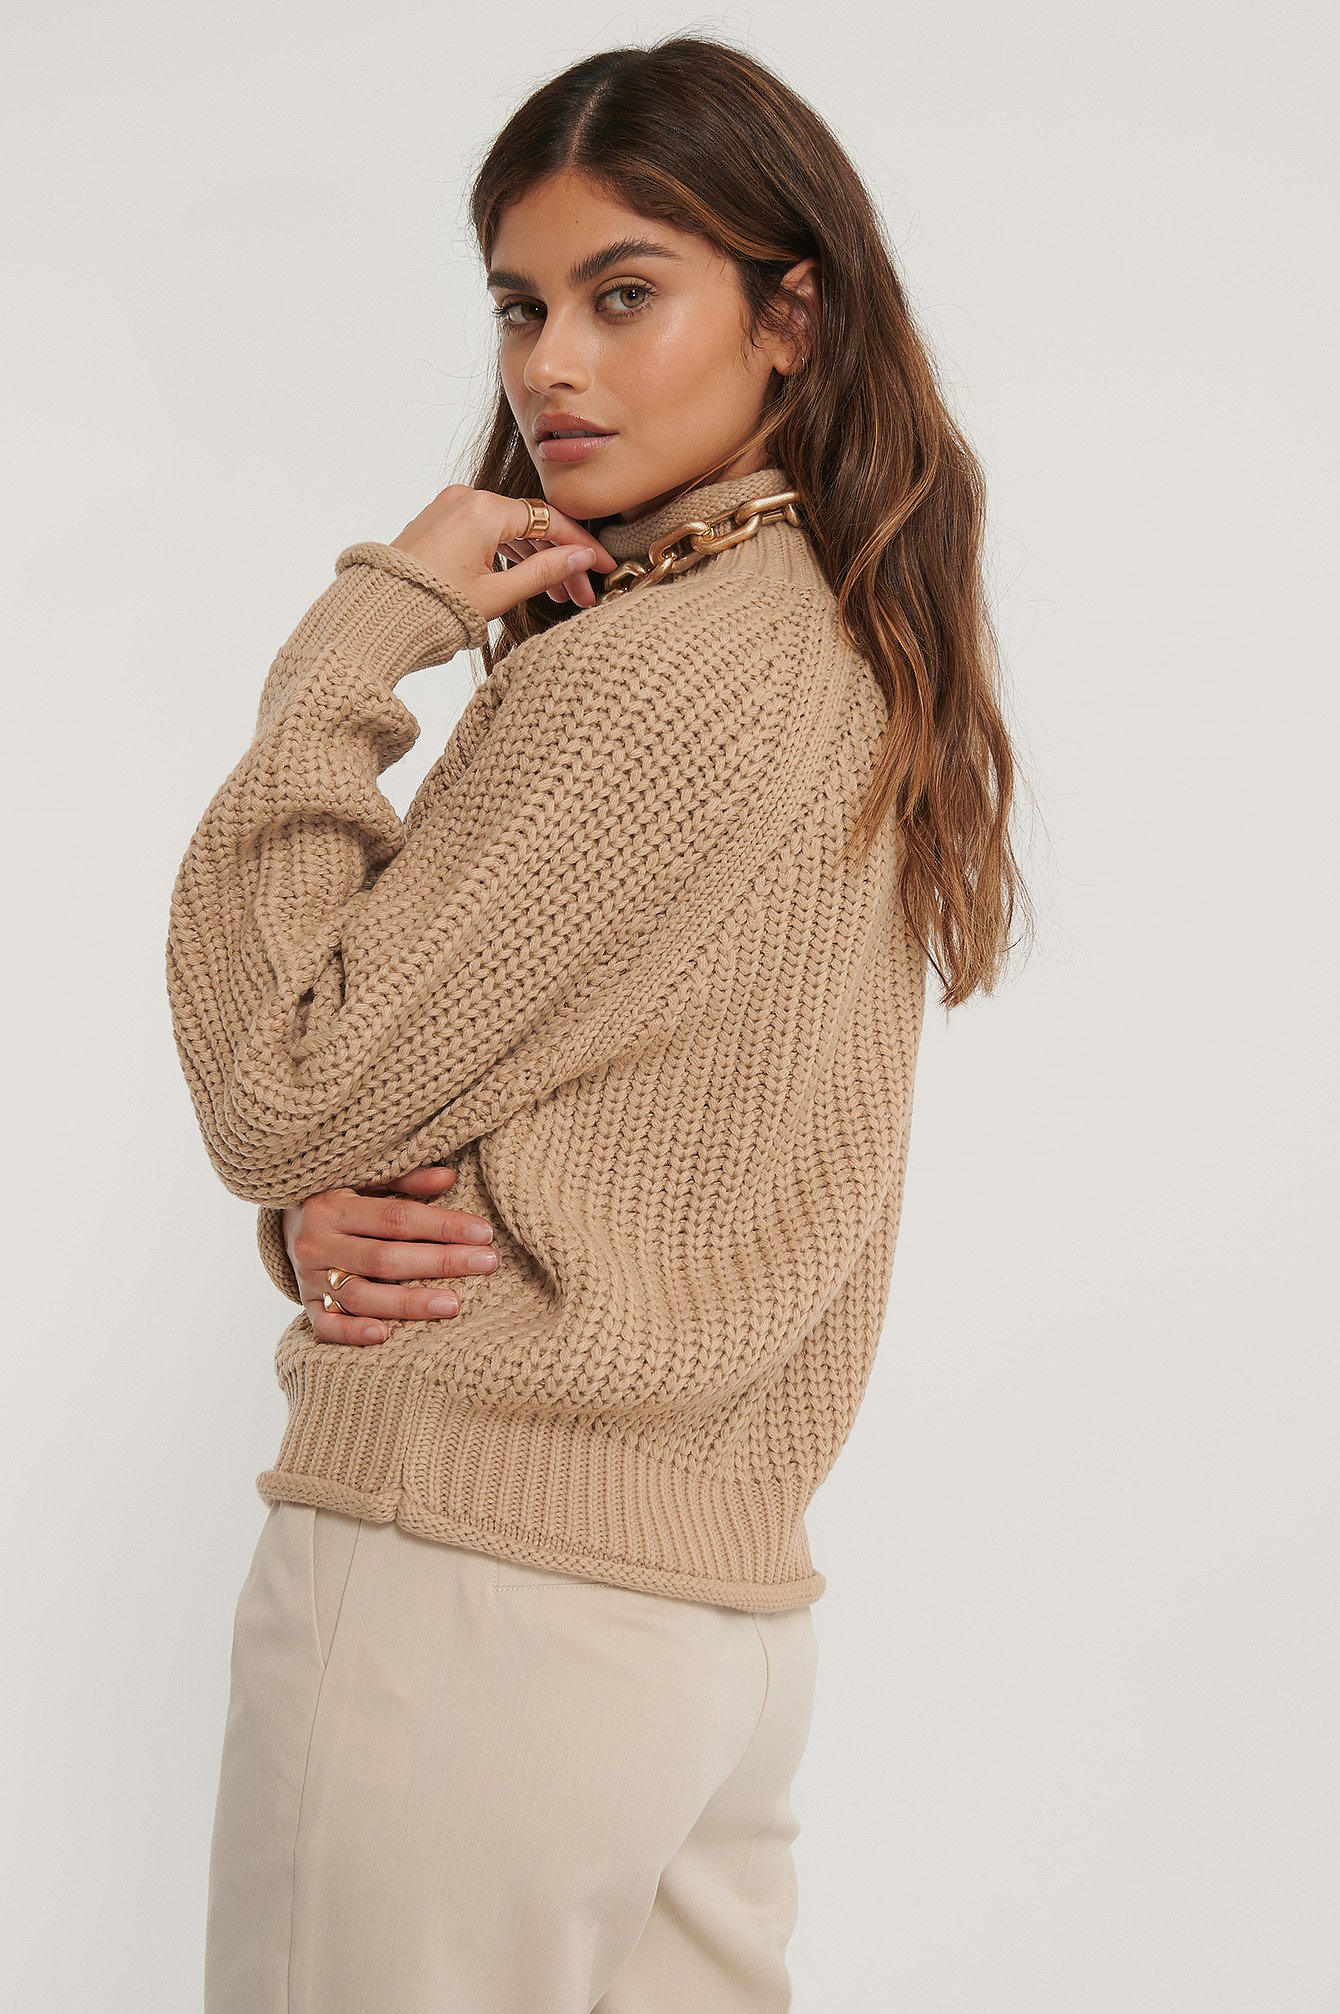 nakd_raglan_sleeve_high_neck_knitted_sweater_1100-003086-0005_03b